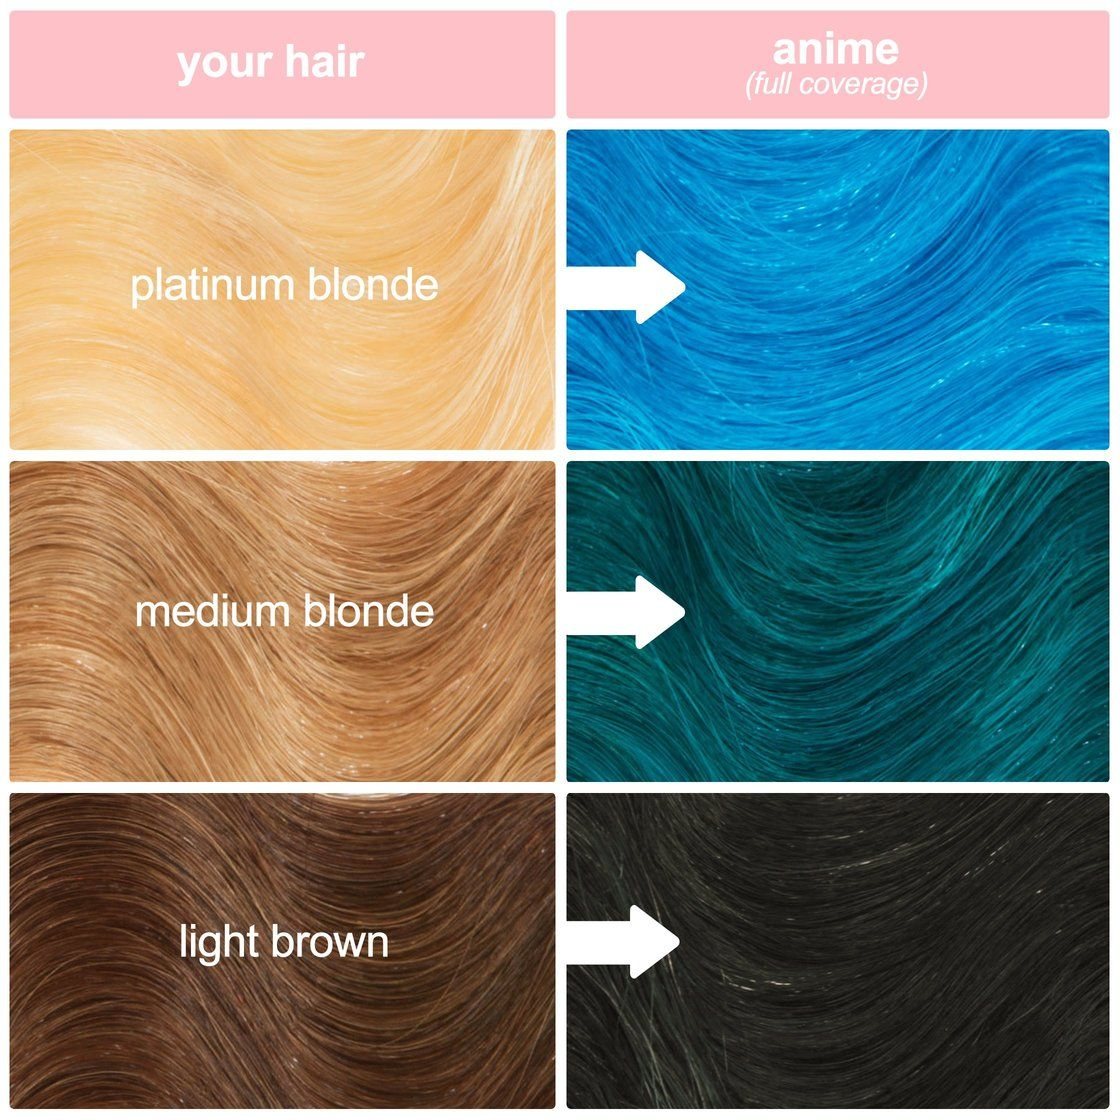 Pin By Bruna Santeli On Blue Ombre Hair In 2020 Unicorn Hair Dye Rose Hair Color Vegan Hair Dye